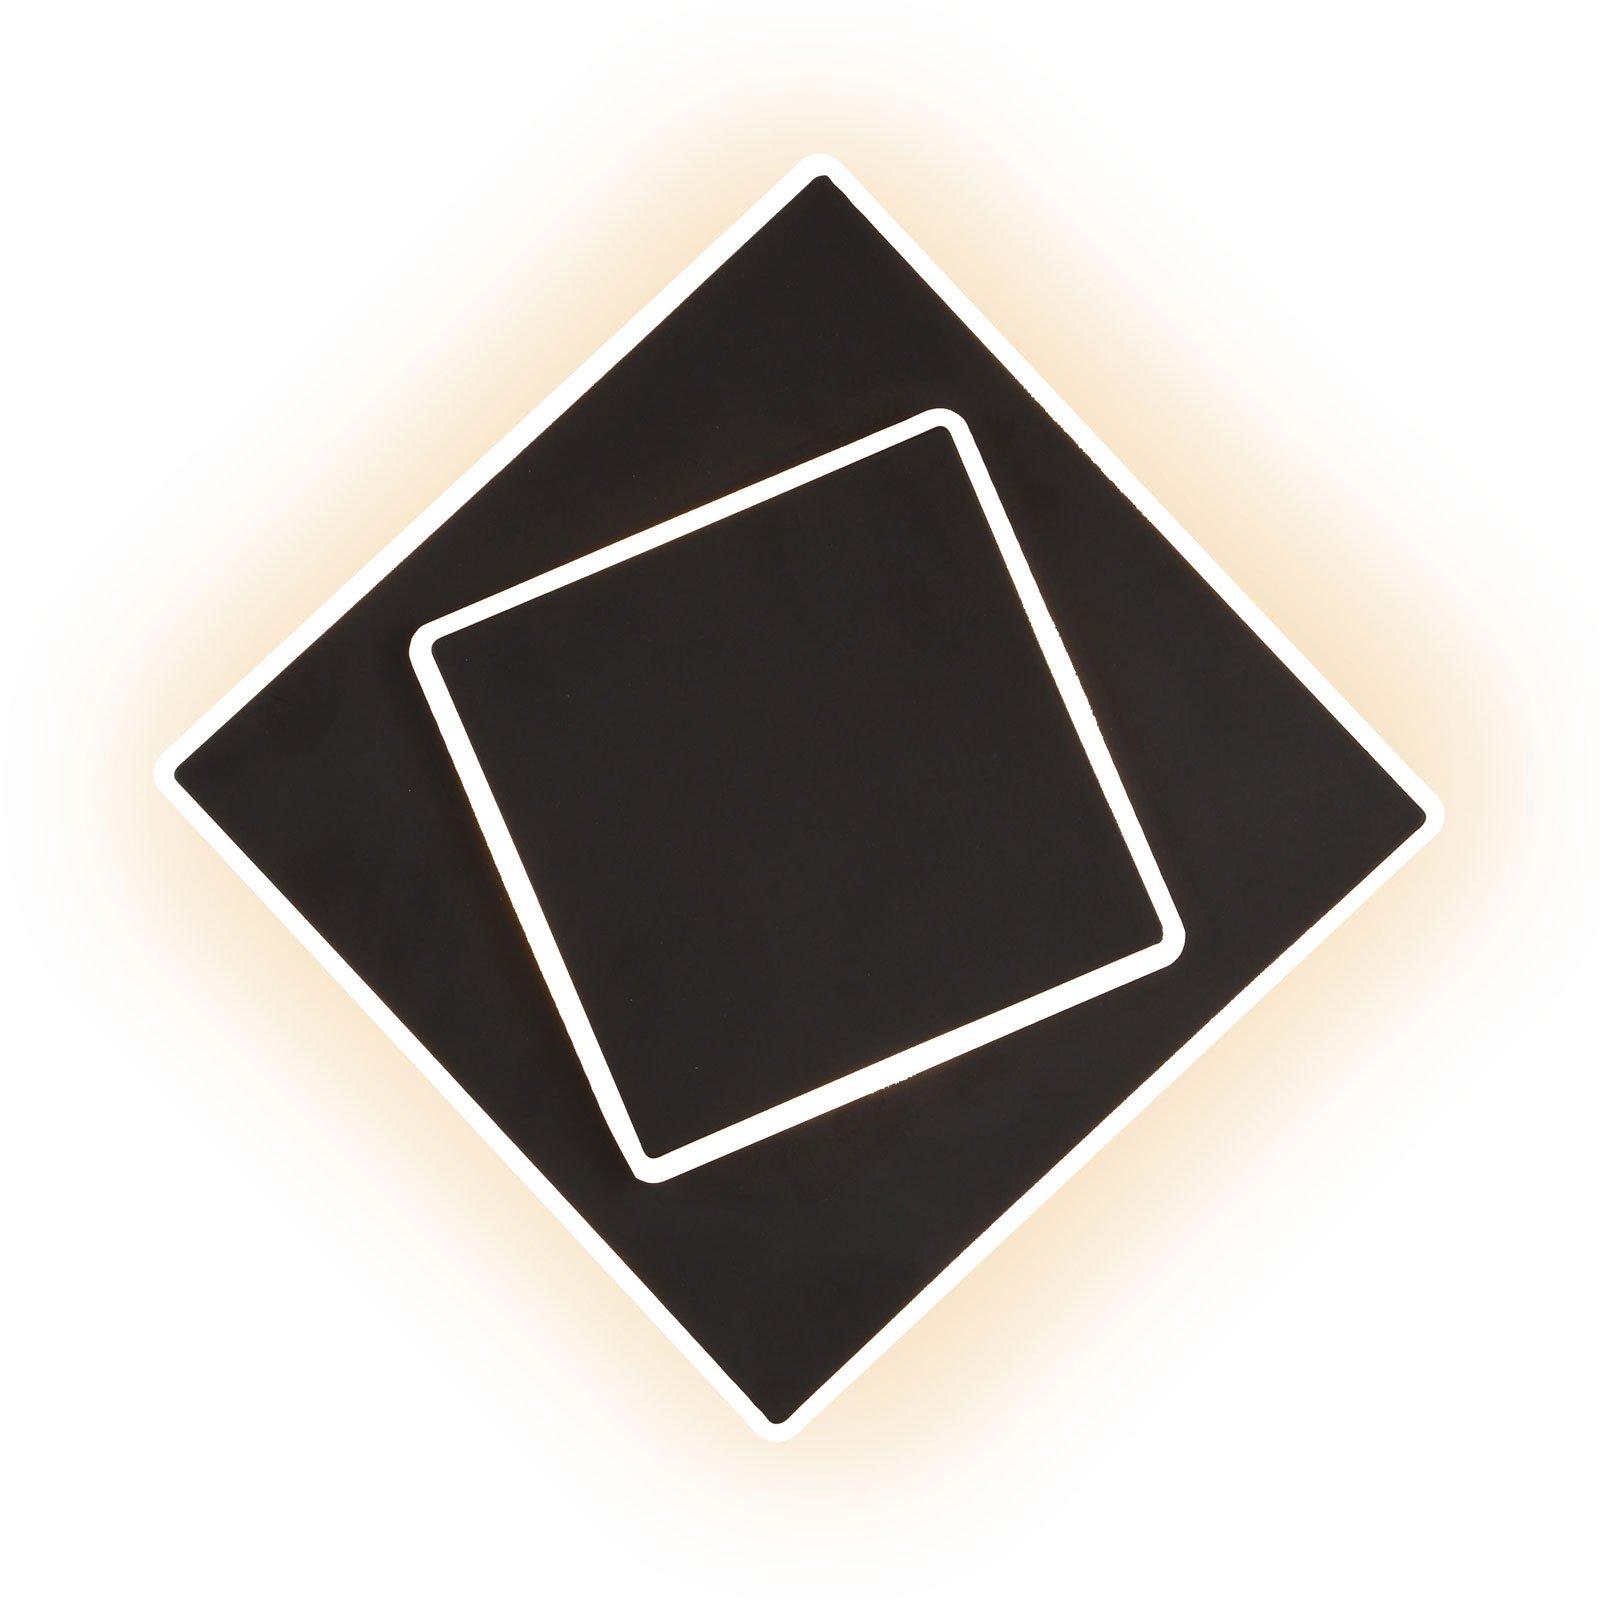 Dakla LED-vegglampe, svart, 18x18 cm